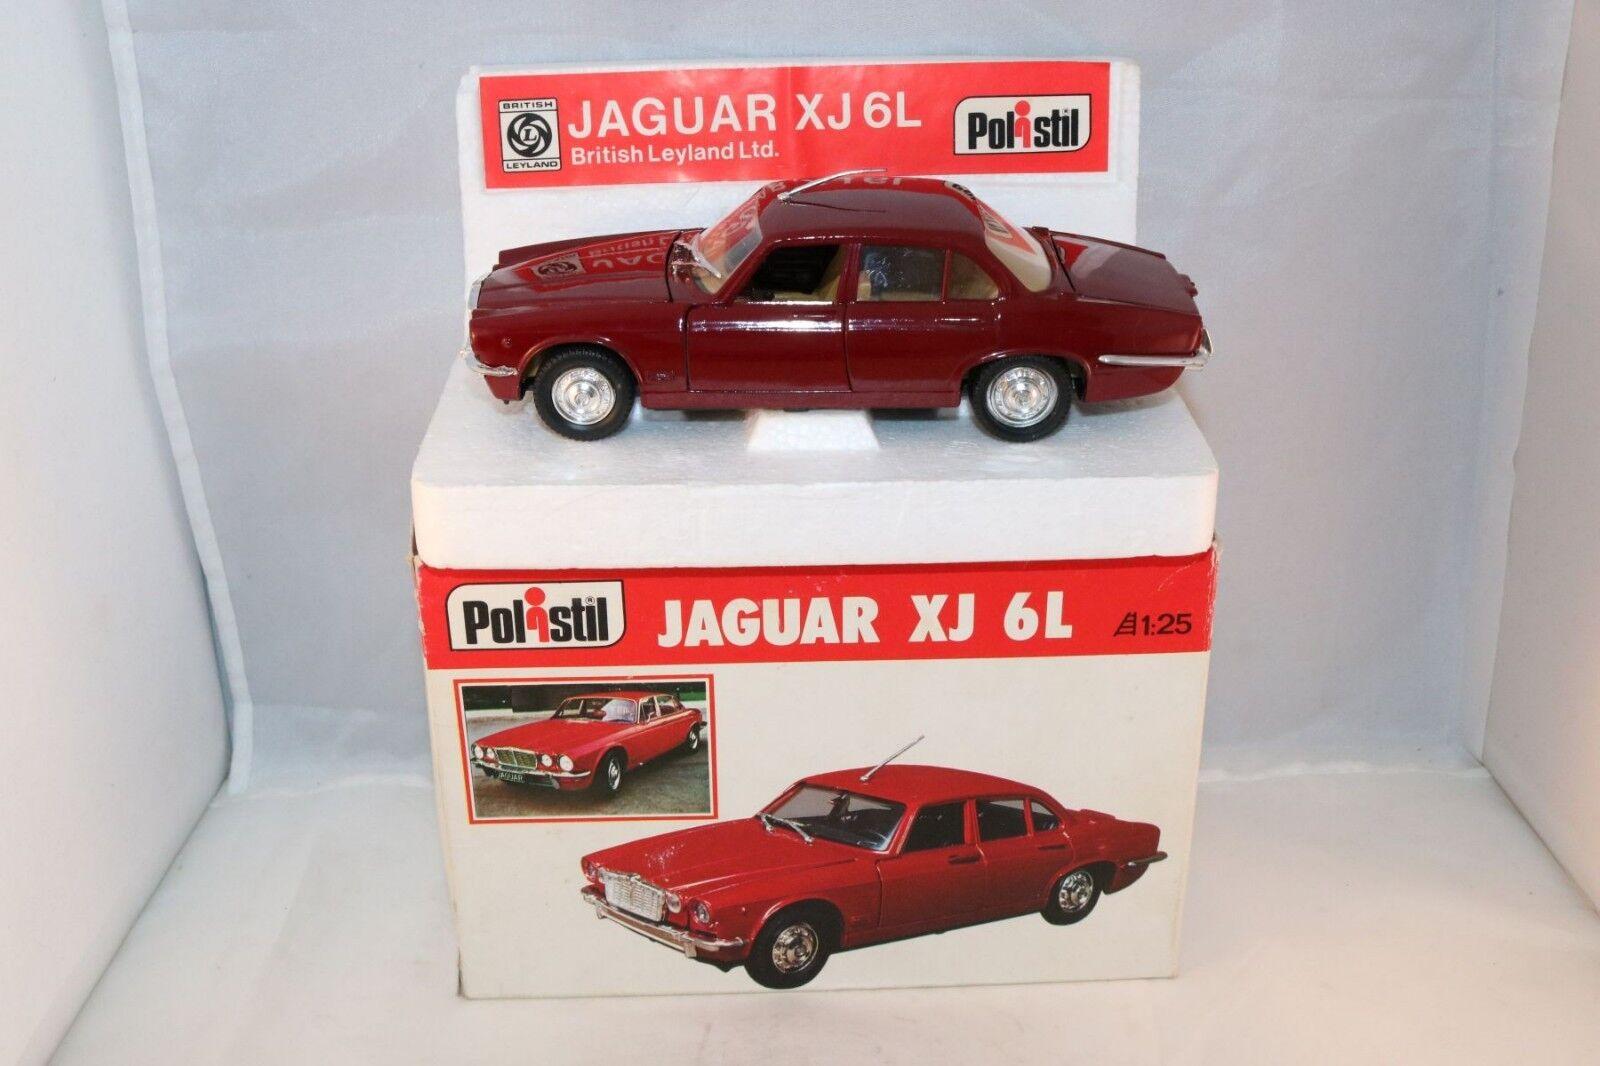 Polistil S31 S.31 Jaguar XJ 6L very near mint in box 1 25 selten Superb a beauty